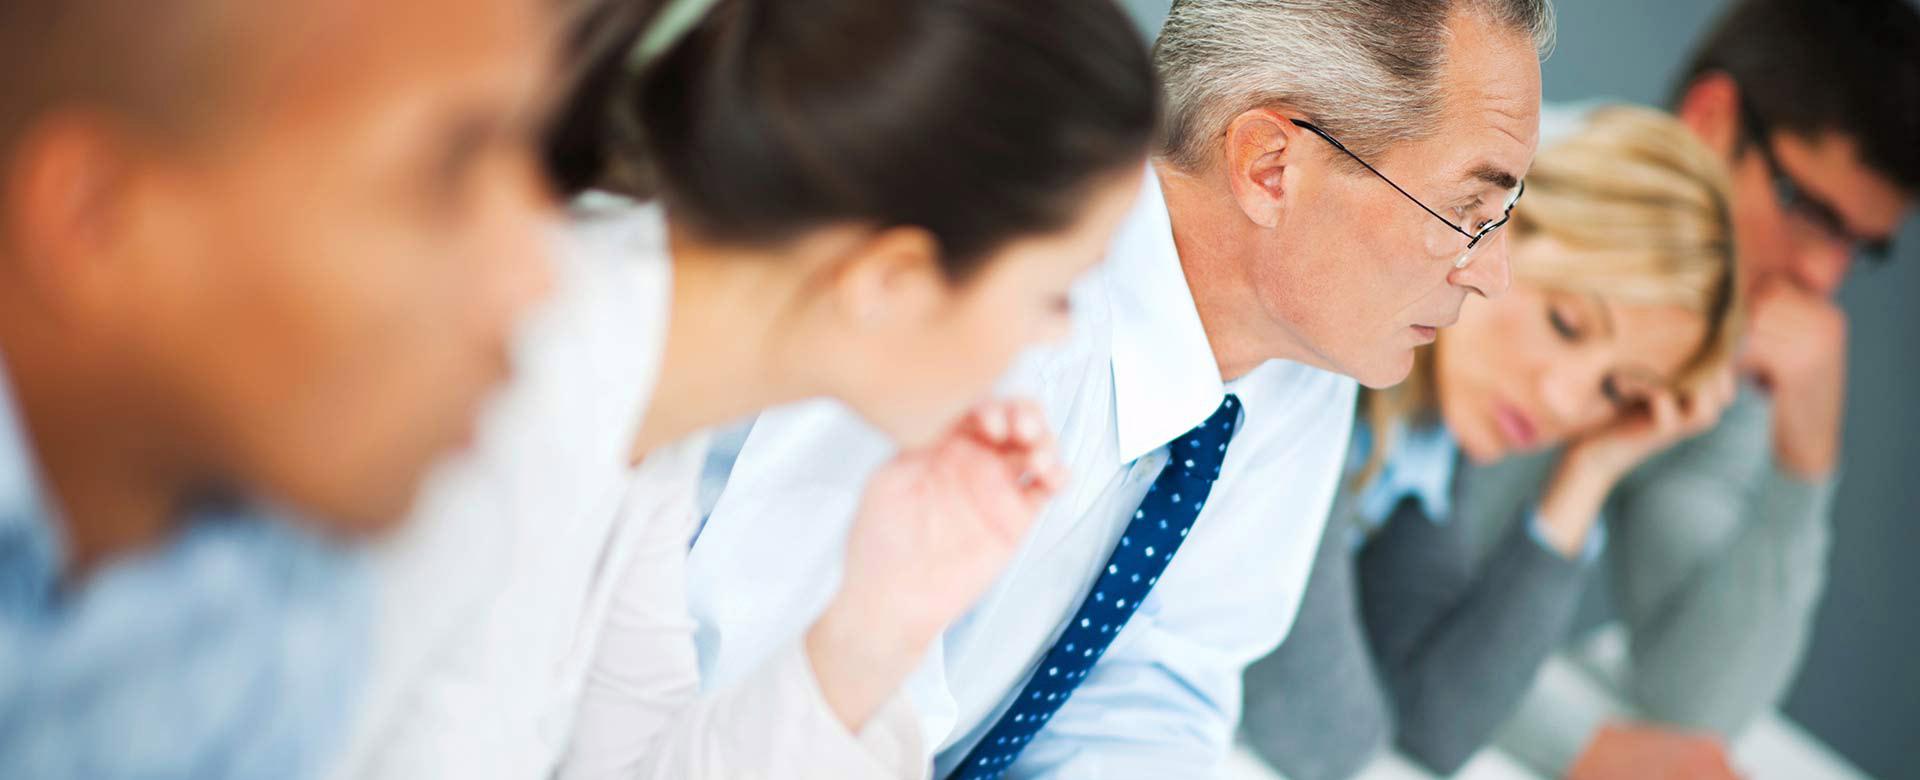 Executives in intense meeting